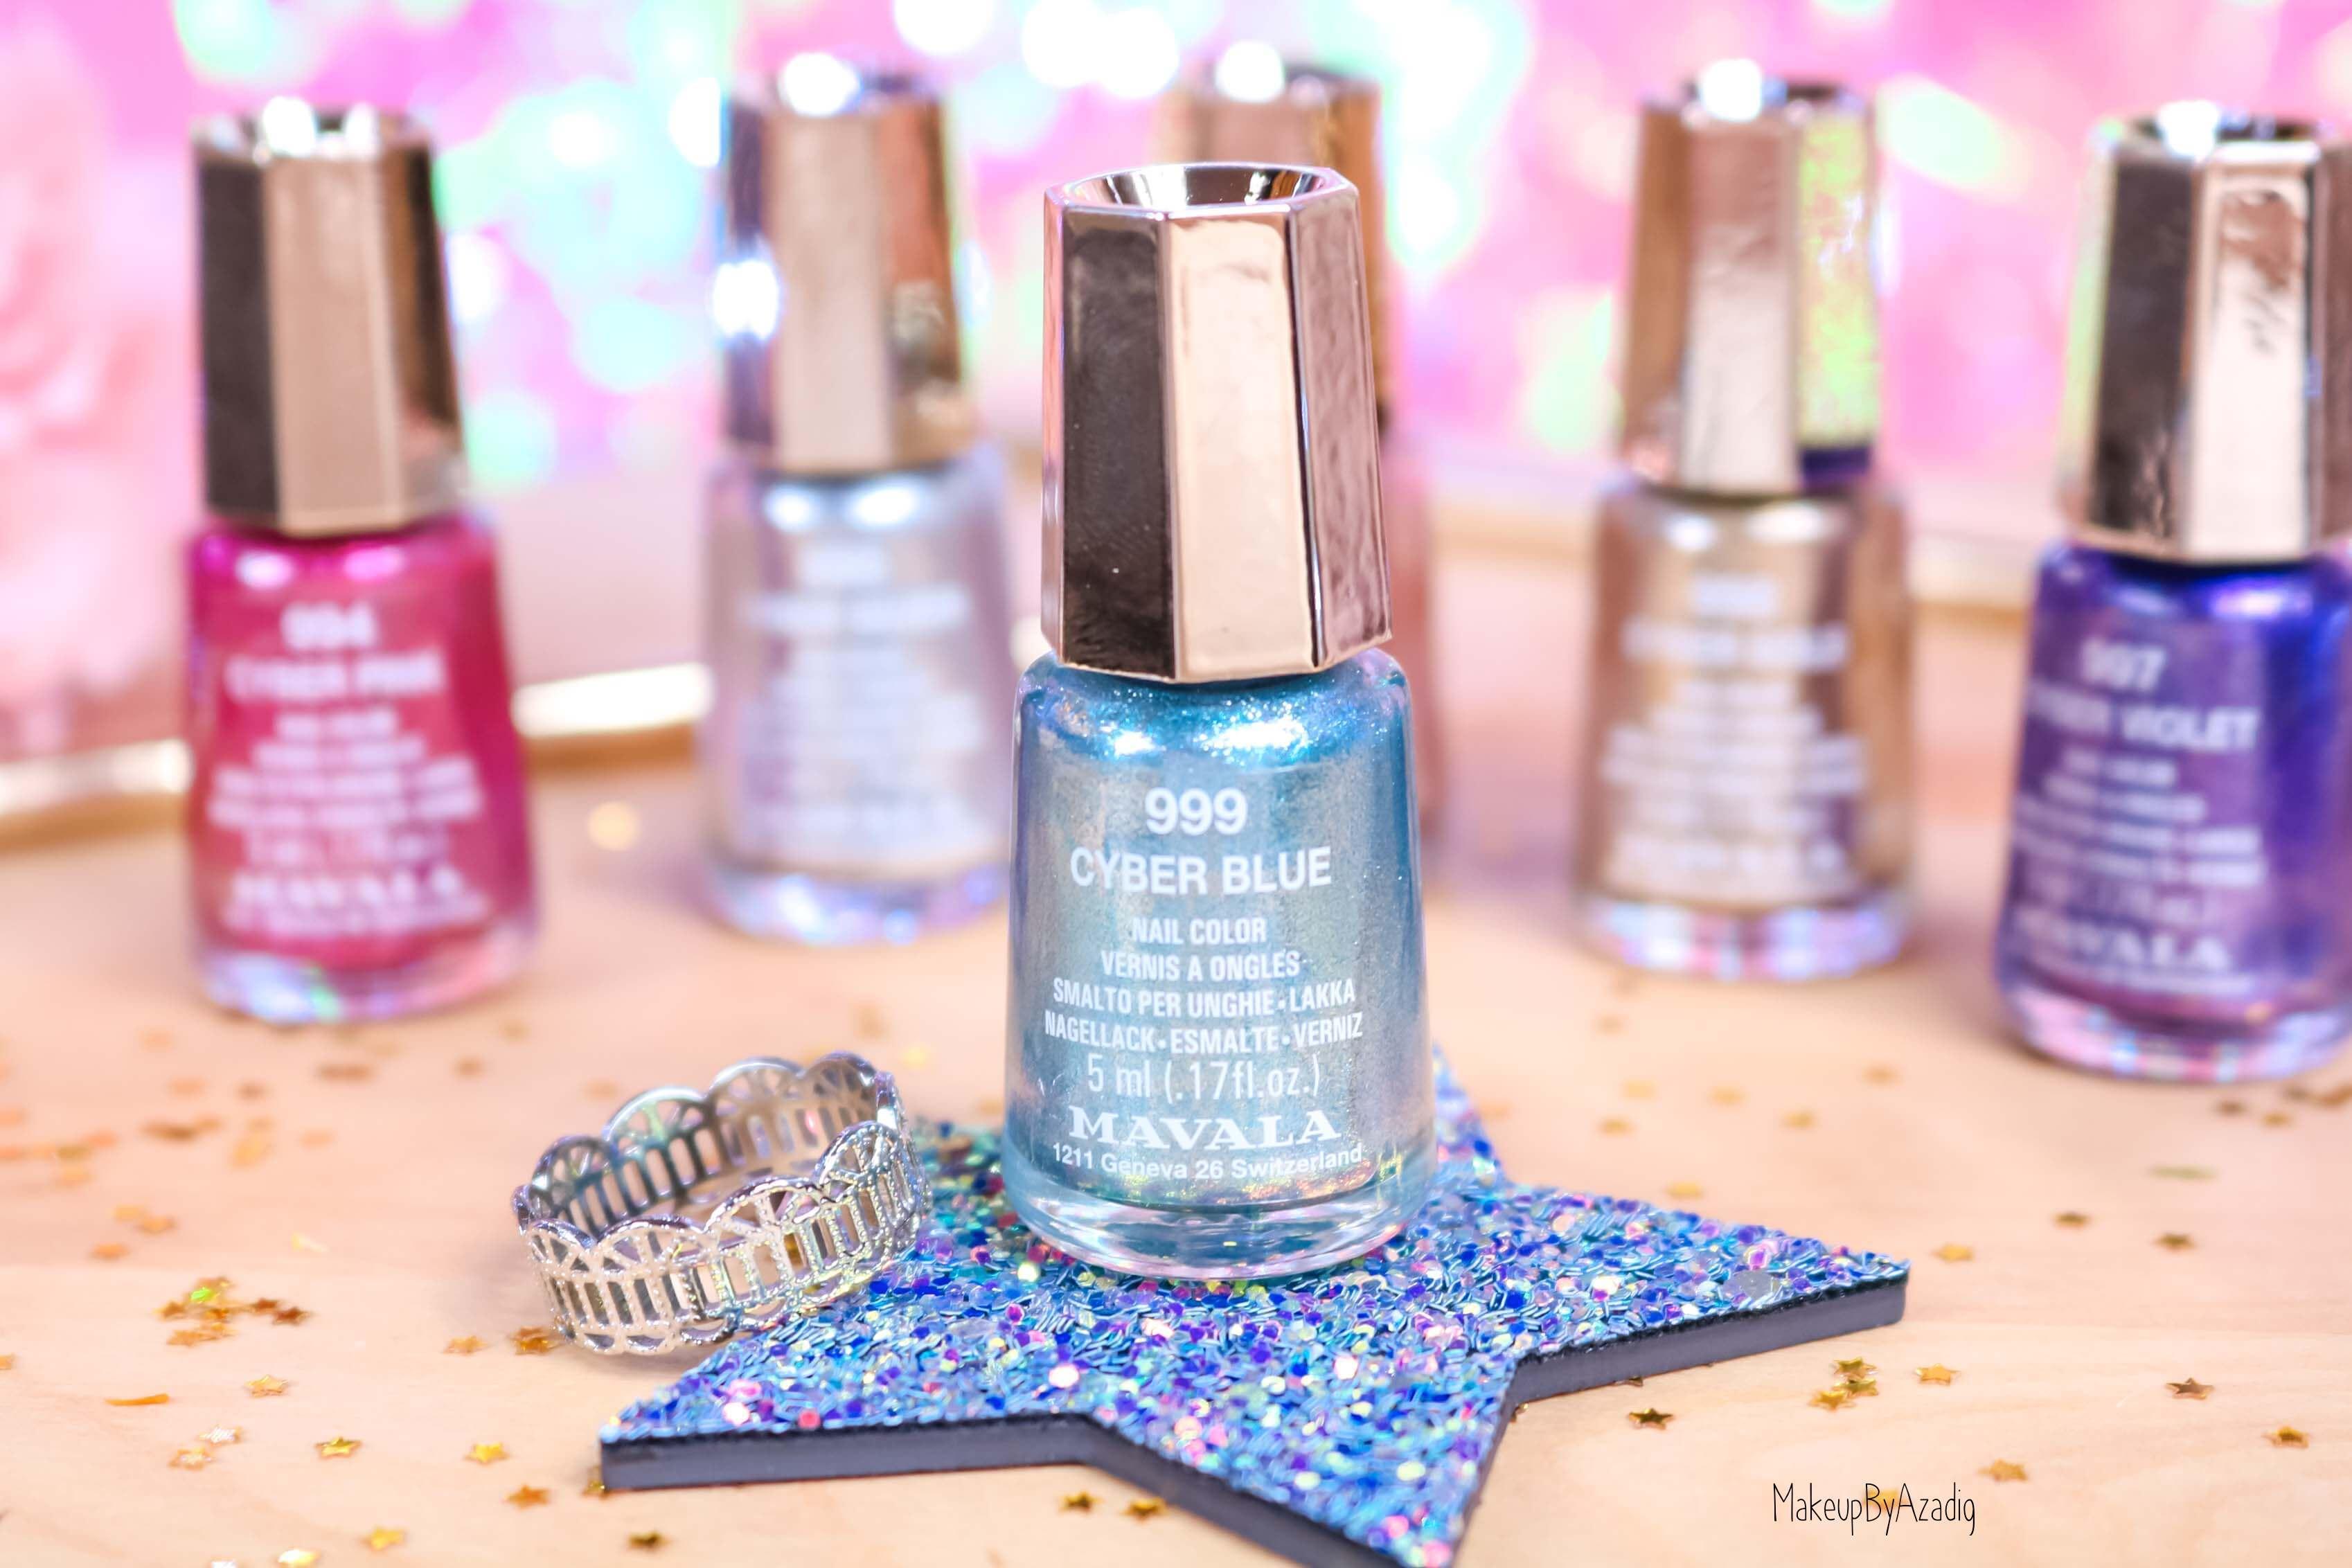 revue-collection-vernis-nails-cyber-chic-fetes-noel-metallique-gold-silver-makeupbyazadig-swatch-avis-prix-blue